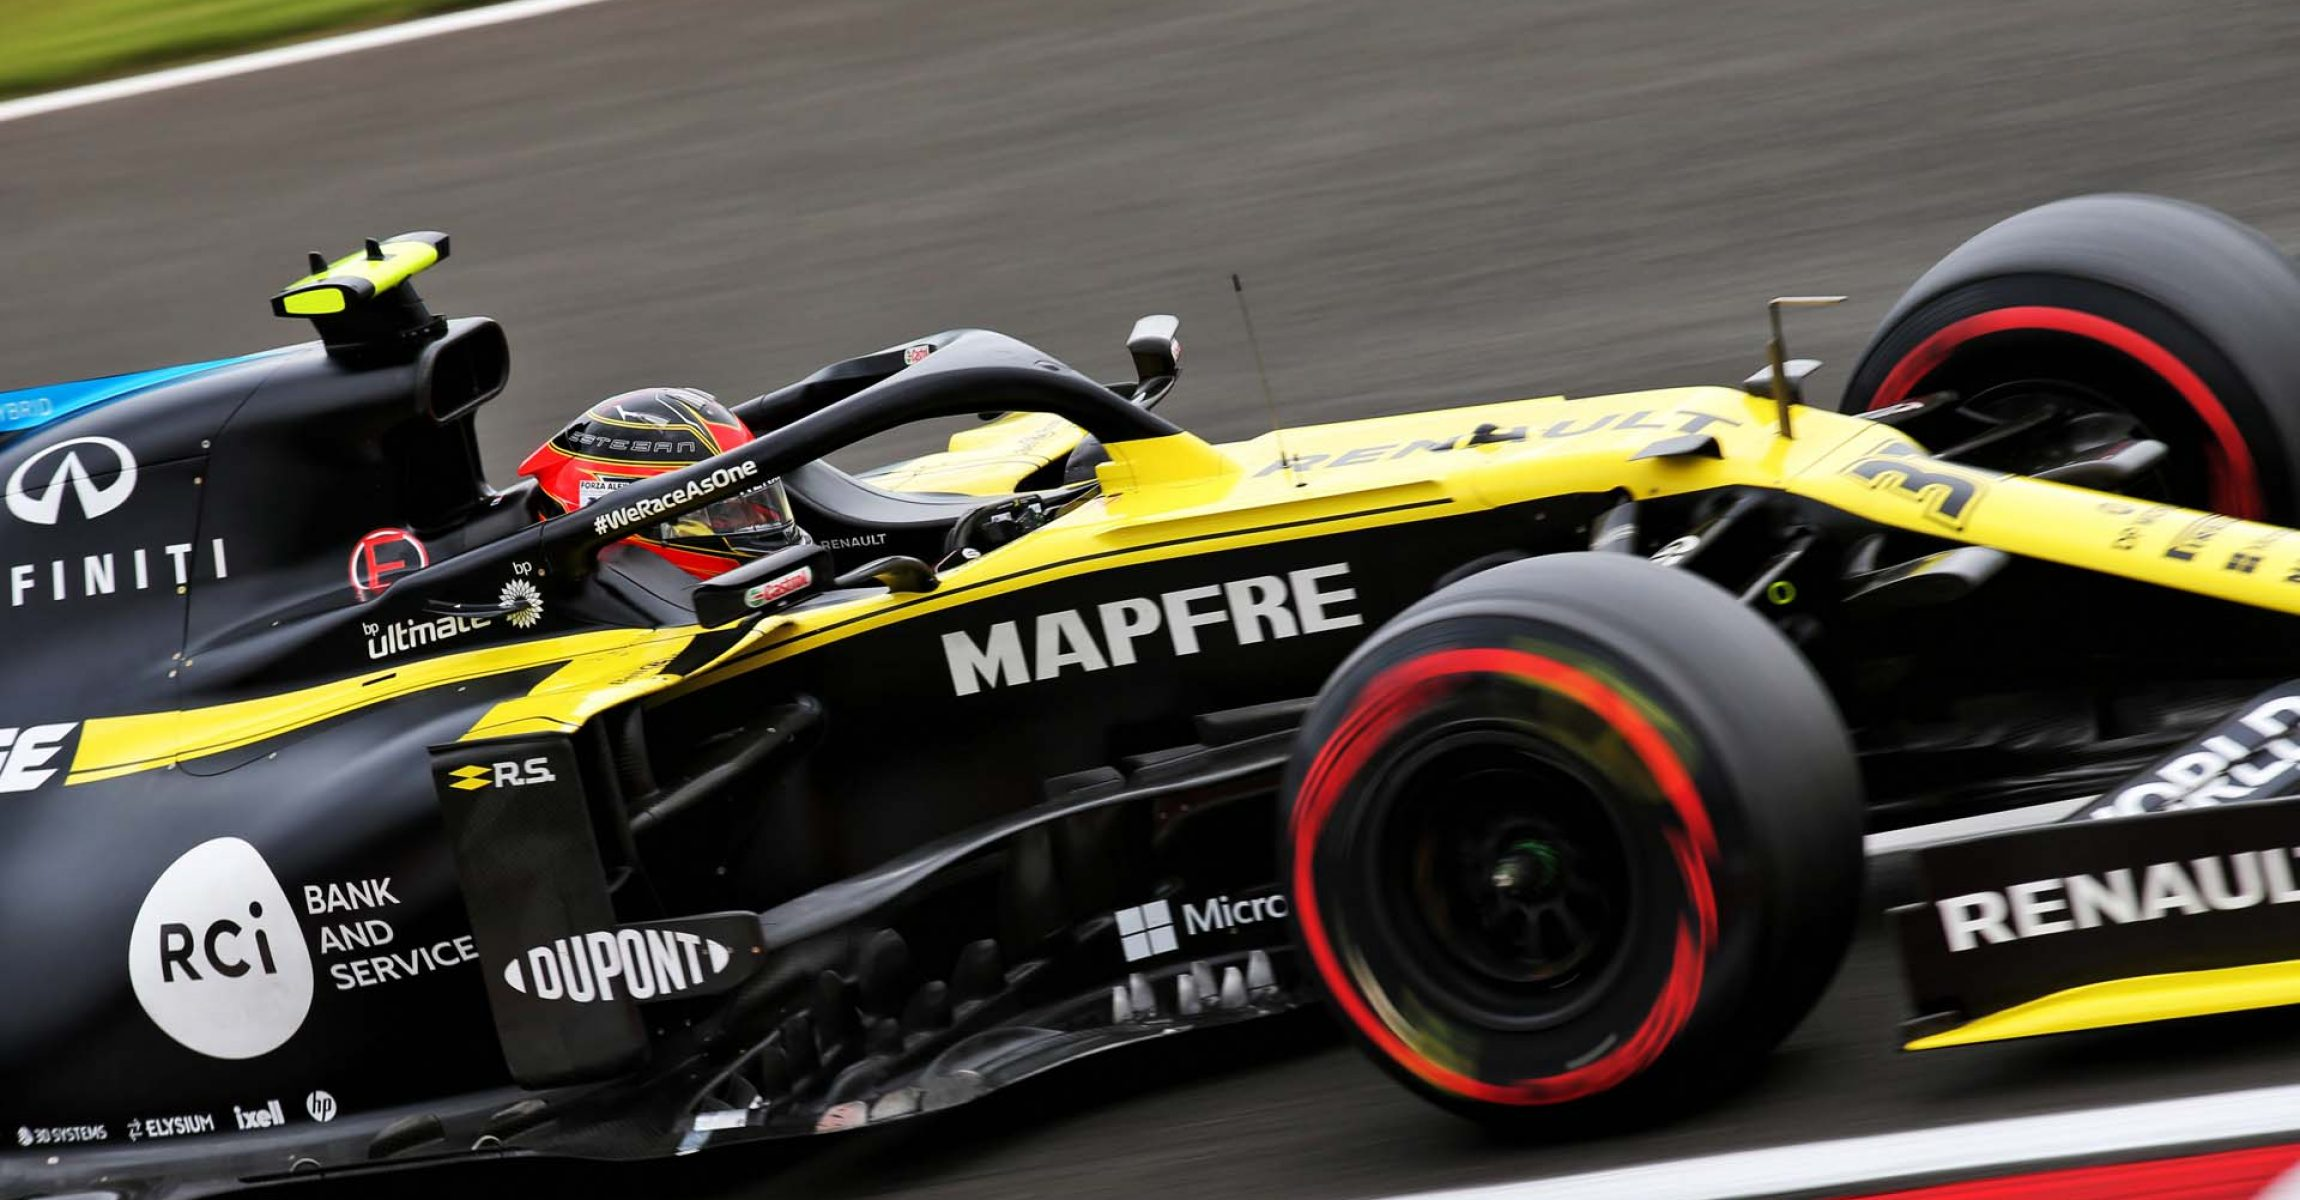 Esteban Ocon (FRA) Renault F1 Team RS20. Hungarian Grand Prix, Saturday 18th July 2020. Budapest, Hungary.